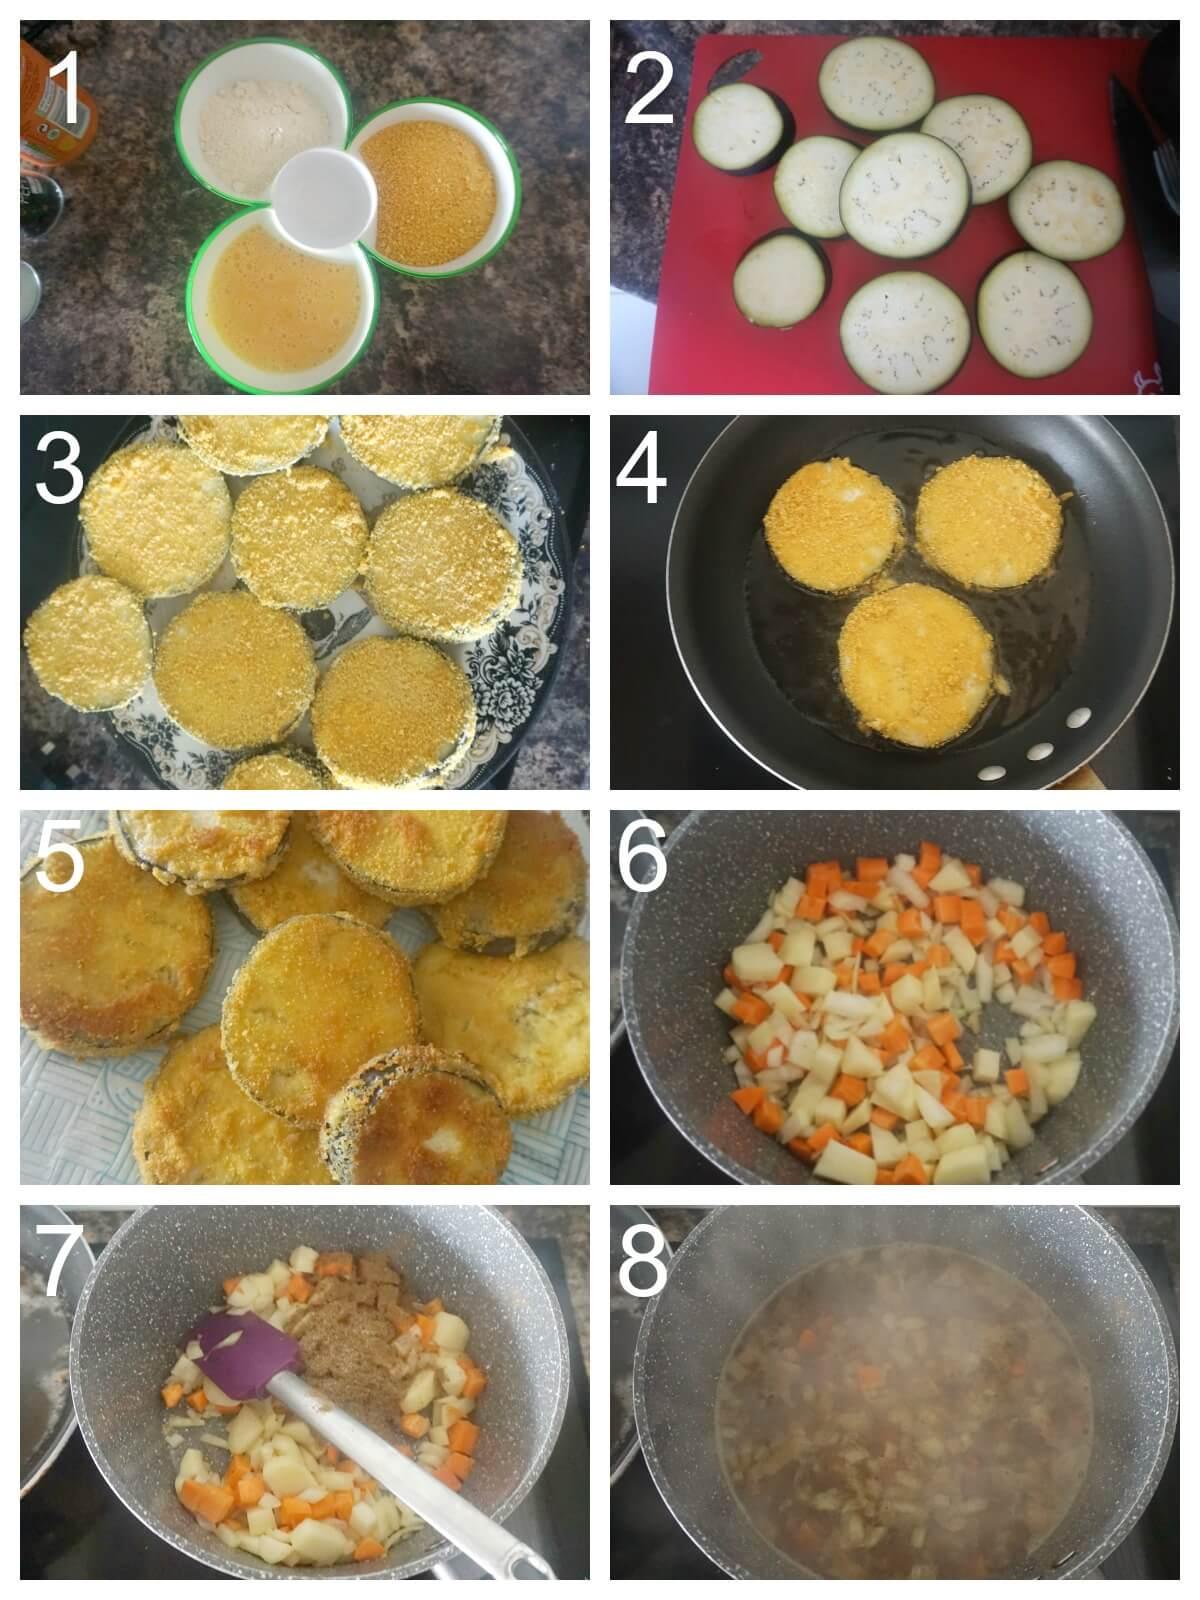 Collage of 8 photos to show how to make eggplant katsu